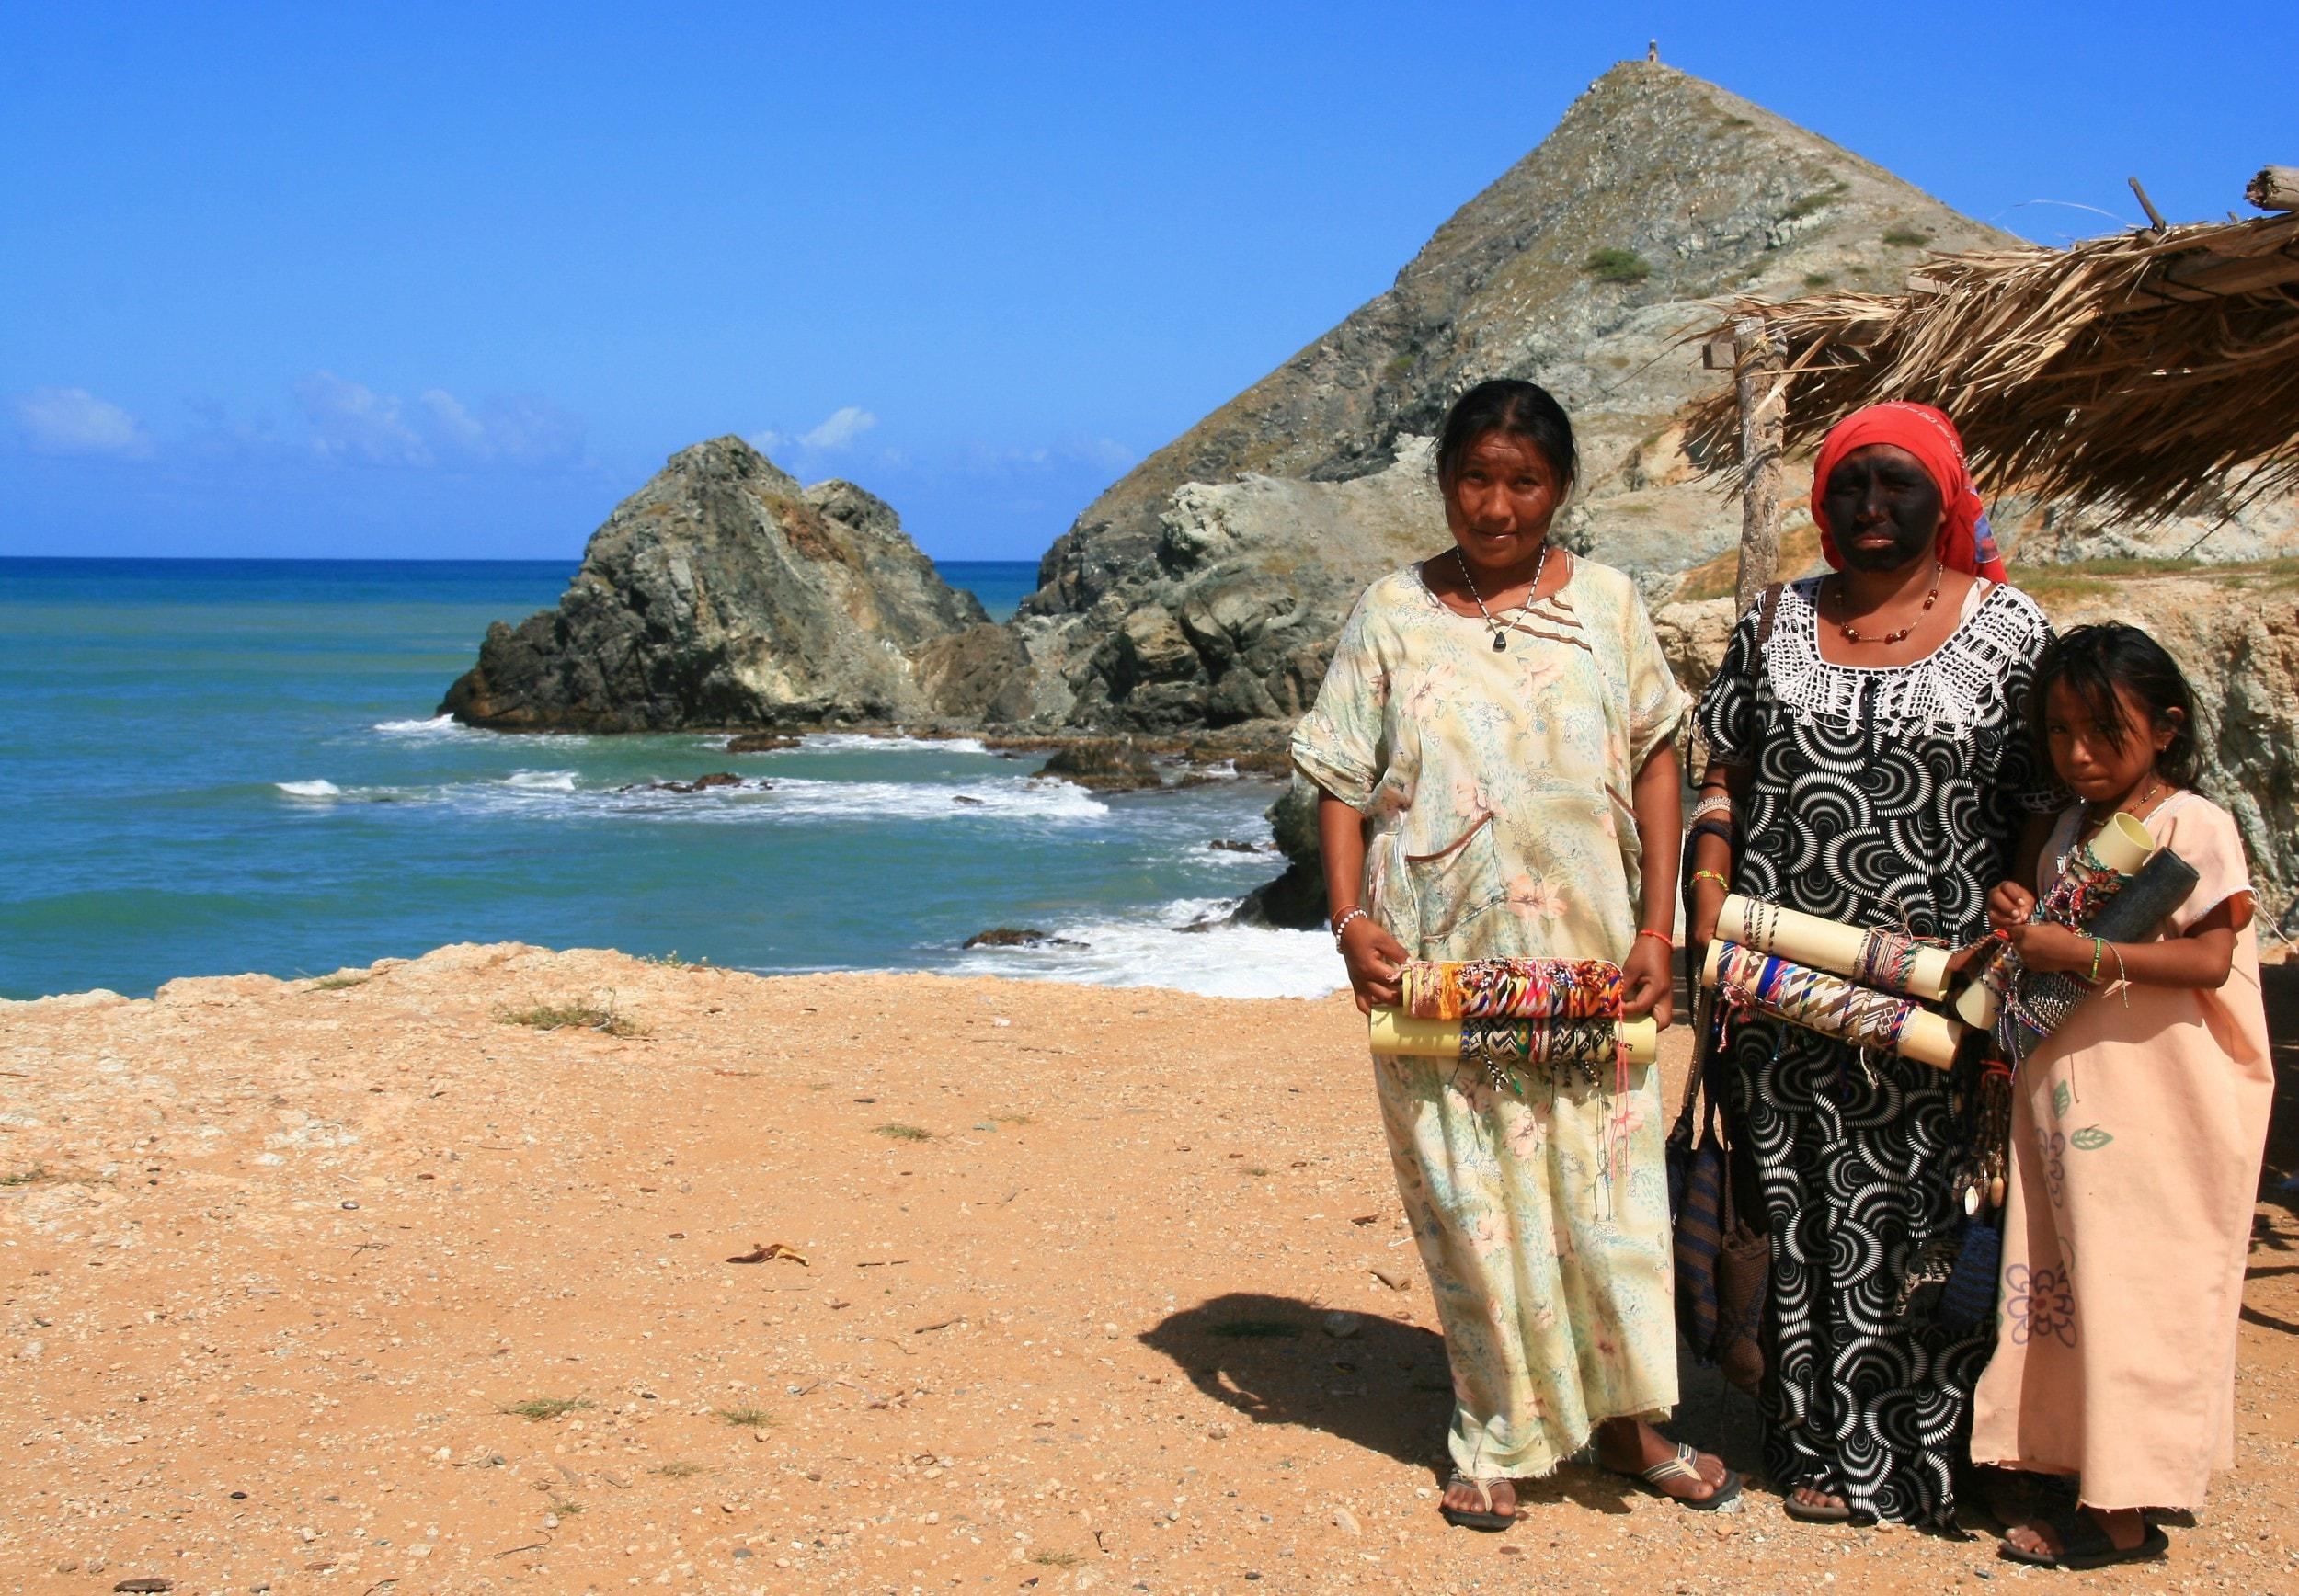 Comunidad Wayuu. Foto: theculturetrip.com/